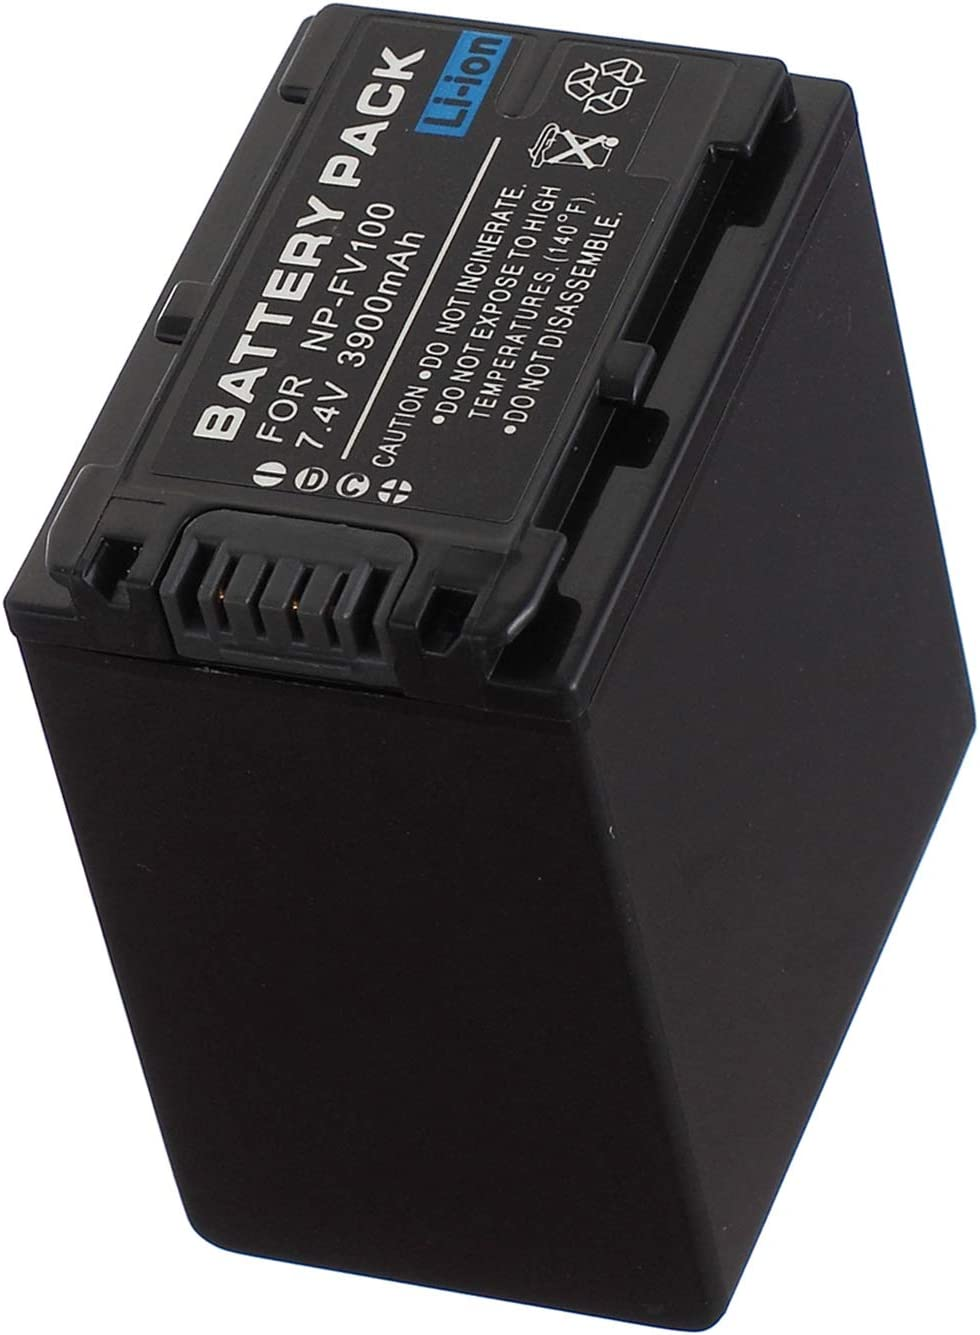 DCR-SX73E Handycam Camcorder Battery for Sony DCR-SX63 DCR-SX65 DCR-SX73 DCR-SX63E DCR-SX65E